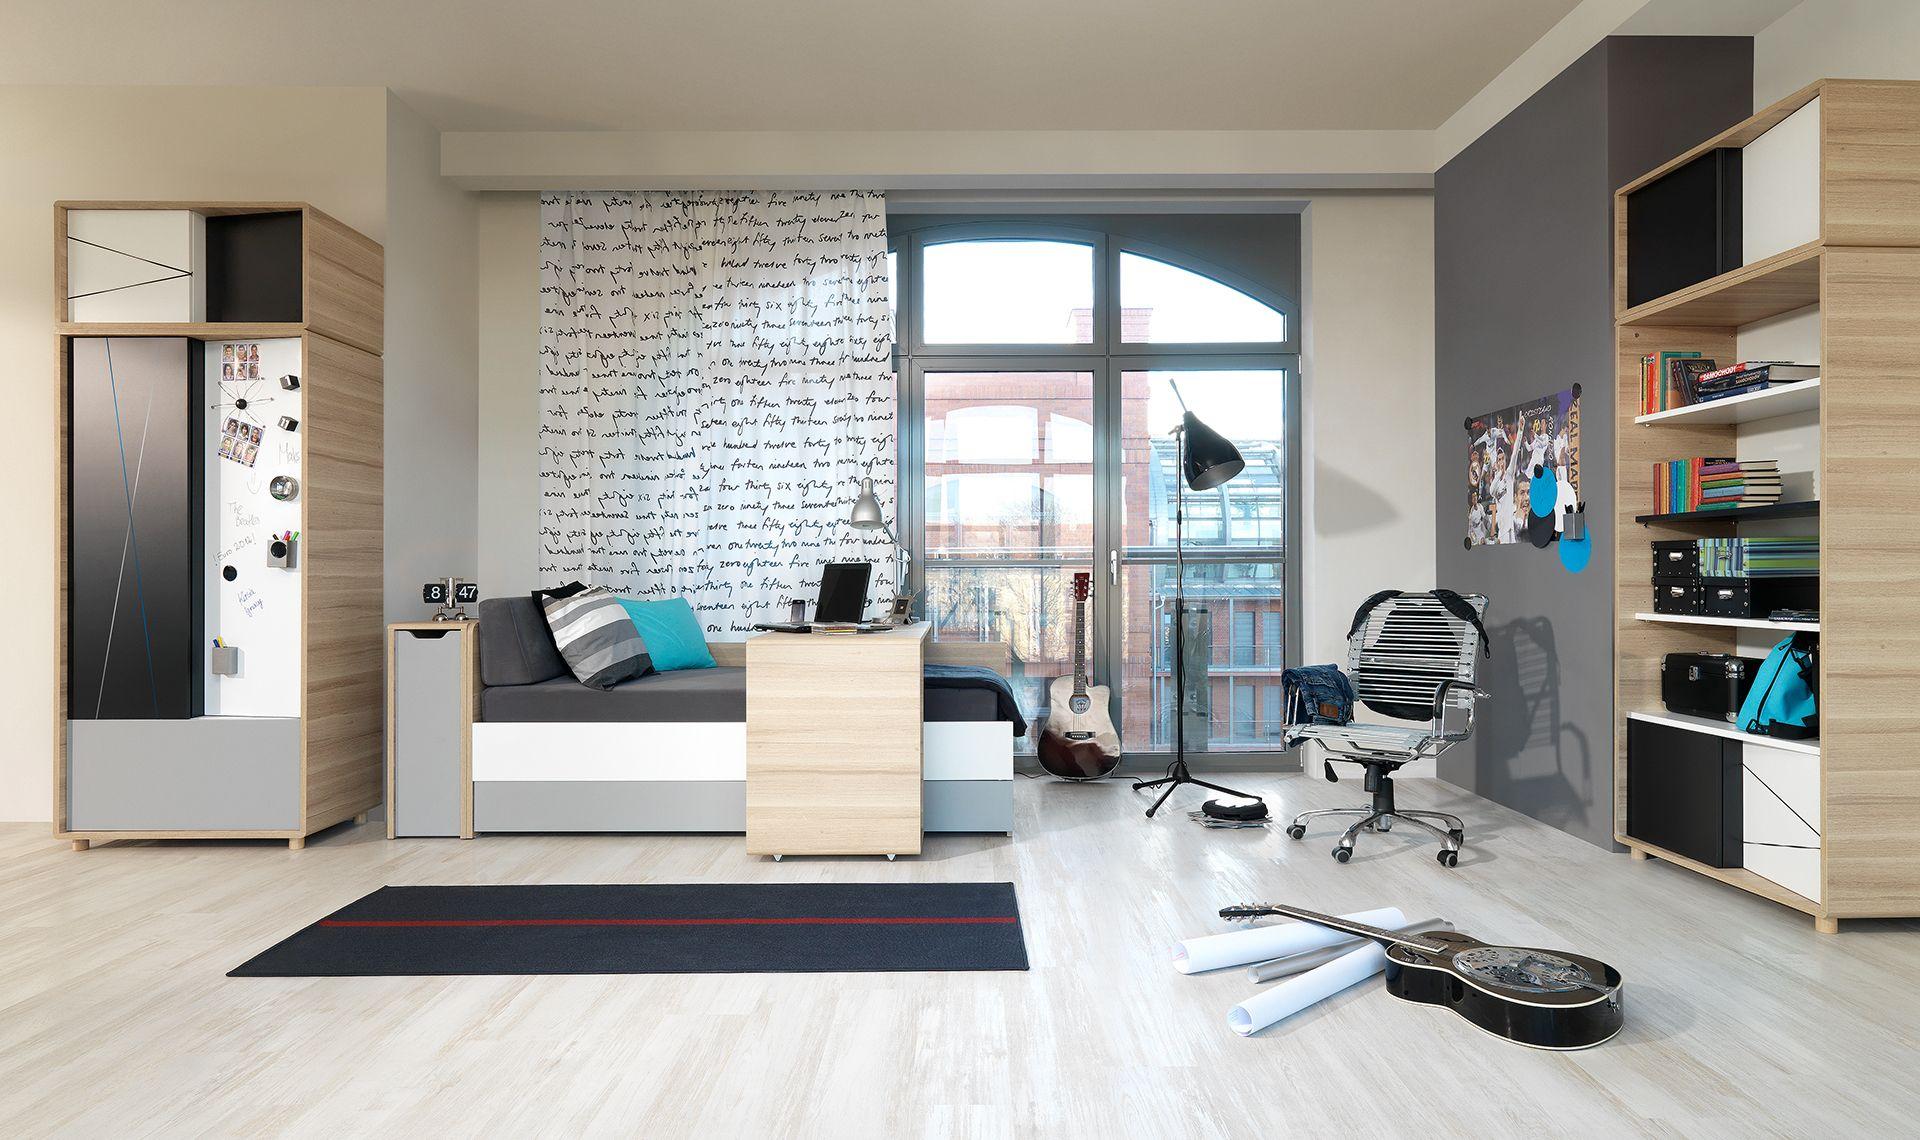 Kanapa łóżko Vox Furniture Teenage Room Boy Room